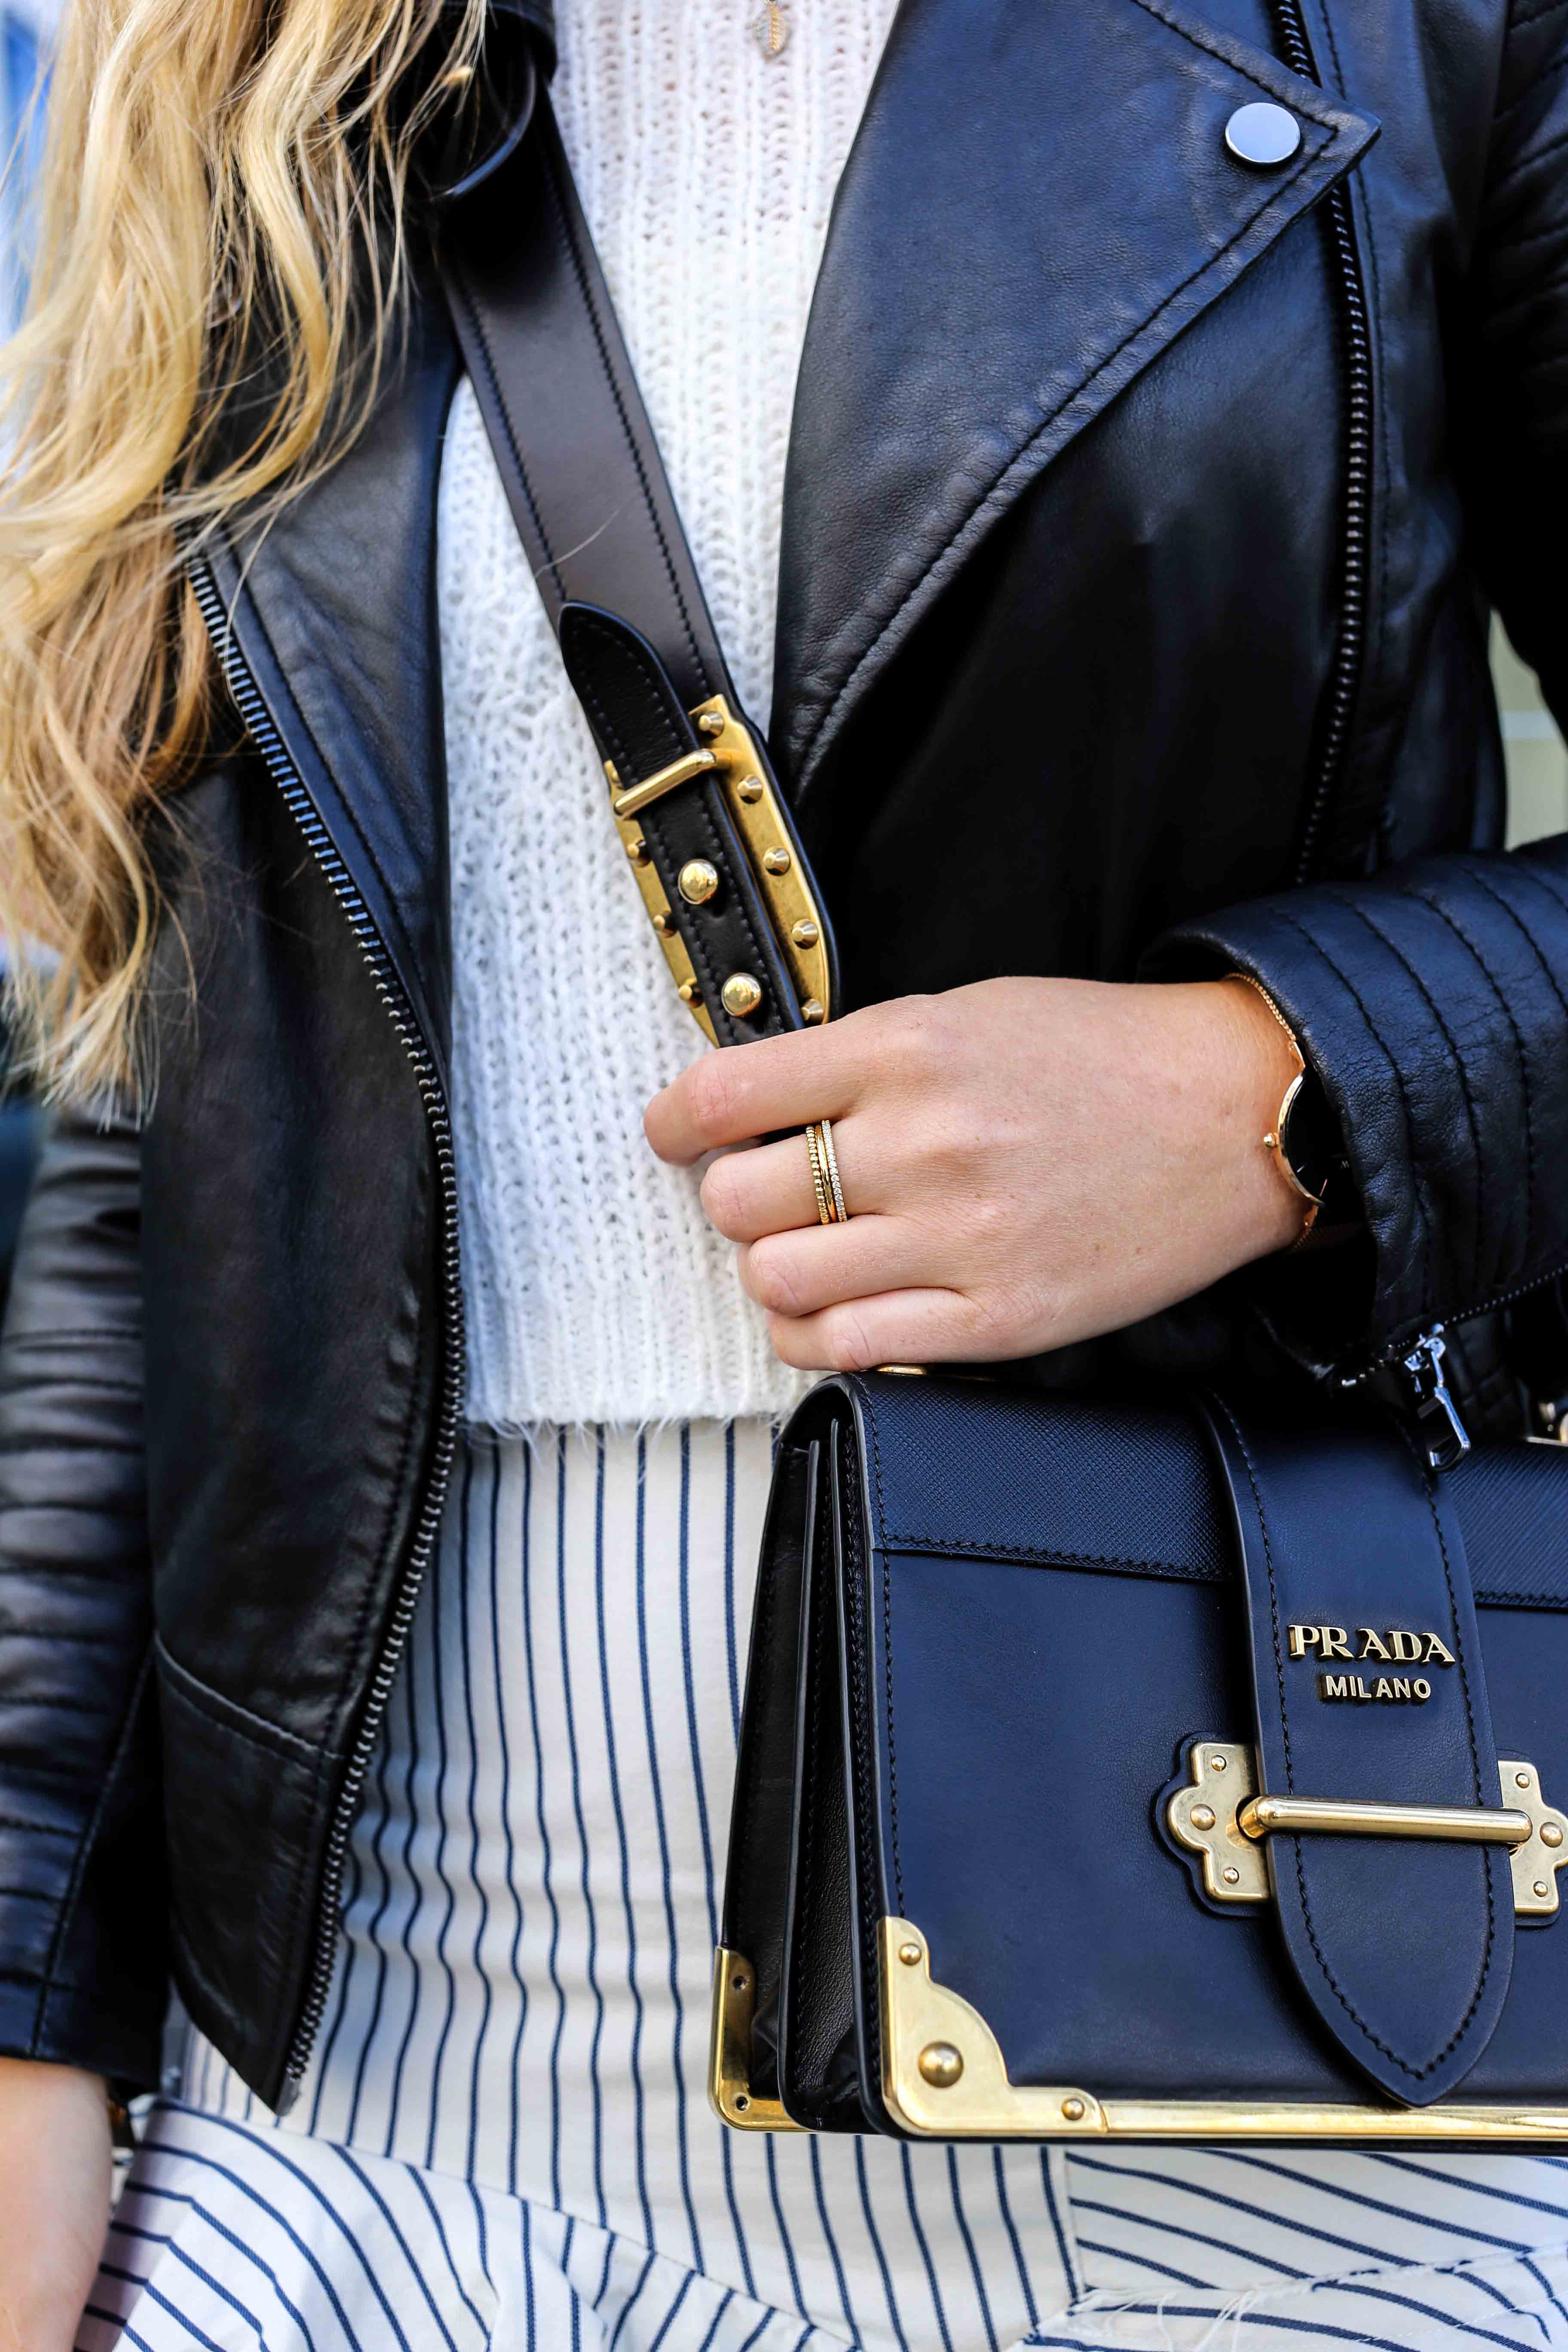 Fashion Week Outfit Berlin Prada Cahier Bag schwarz Thomas Sabo ringe gold Lederjacke Streetstyle Modeblog 2